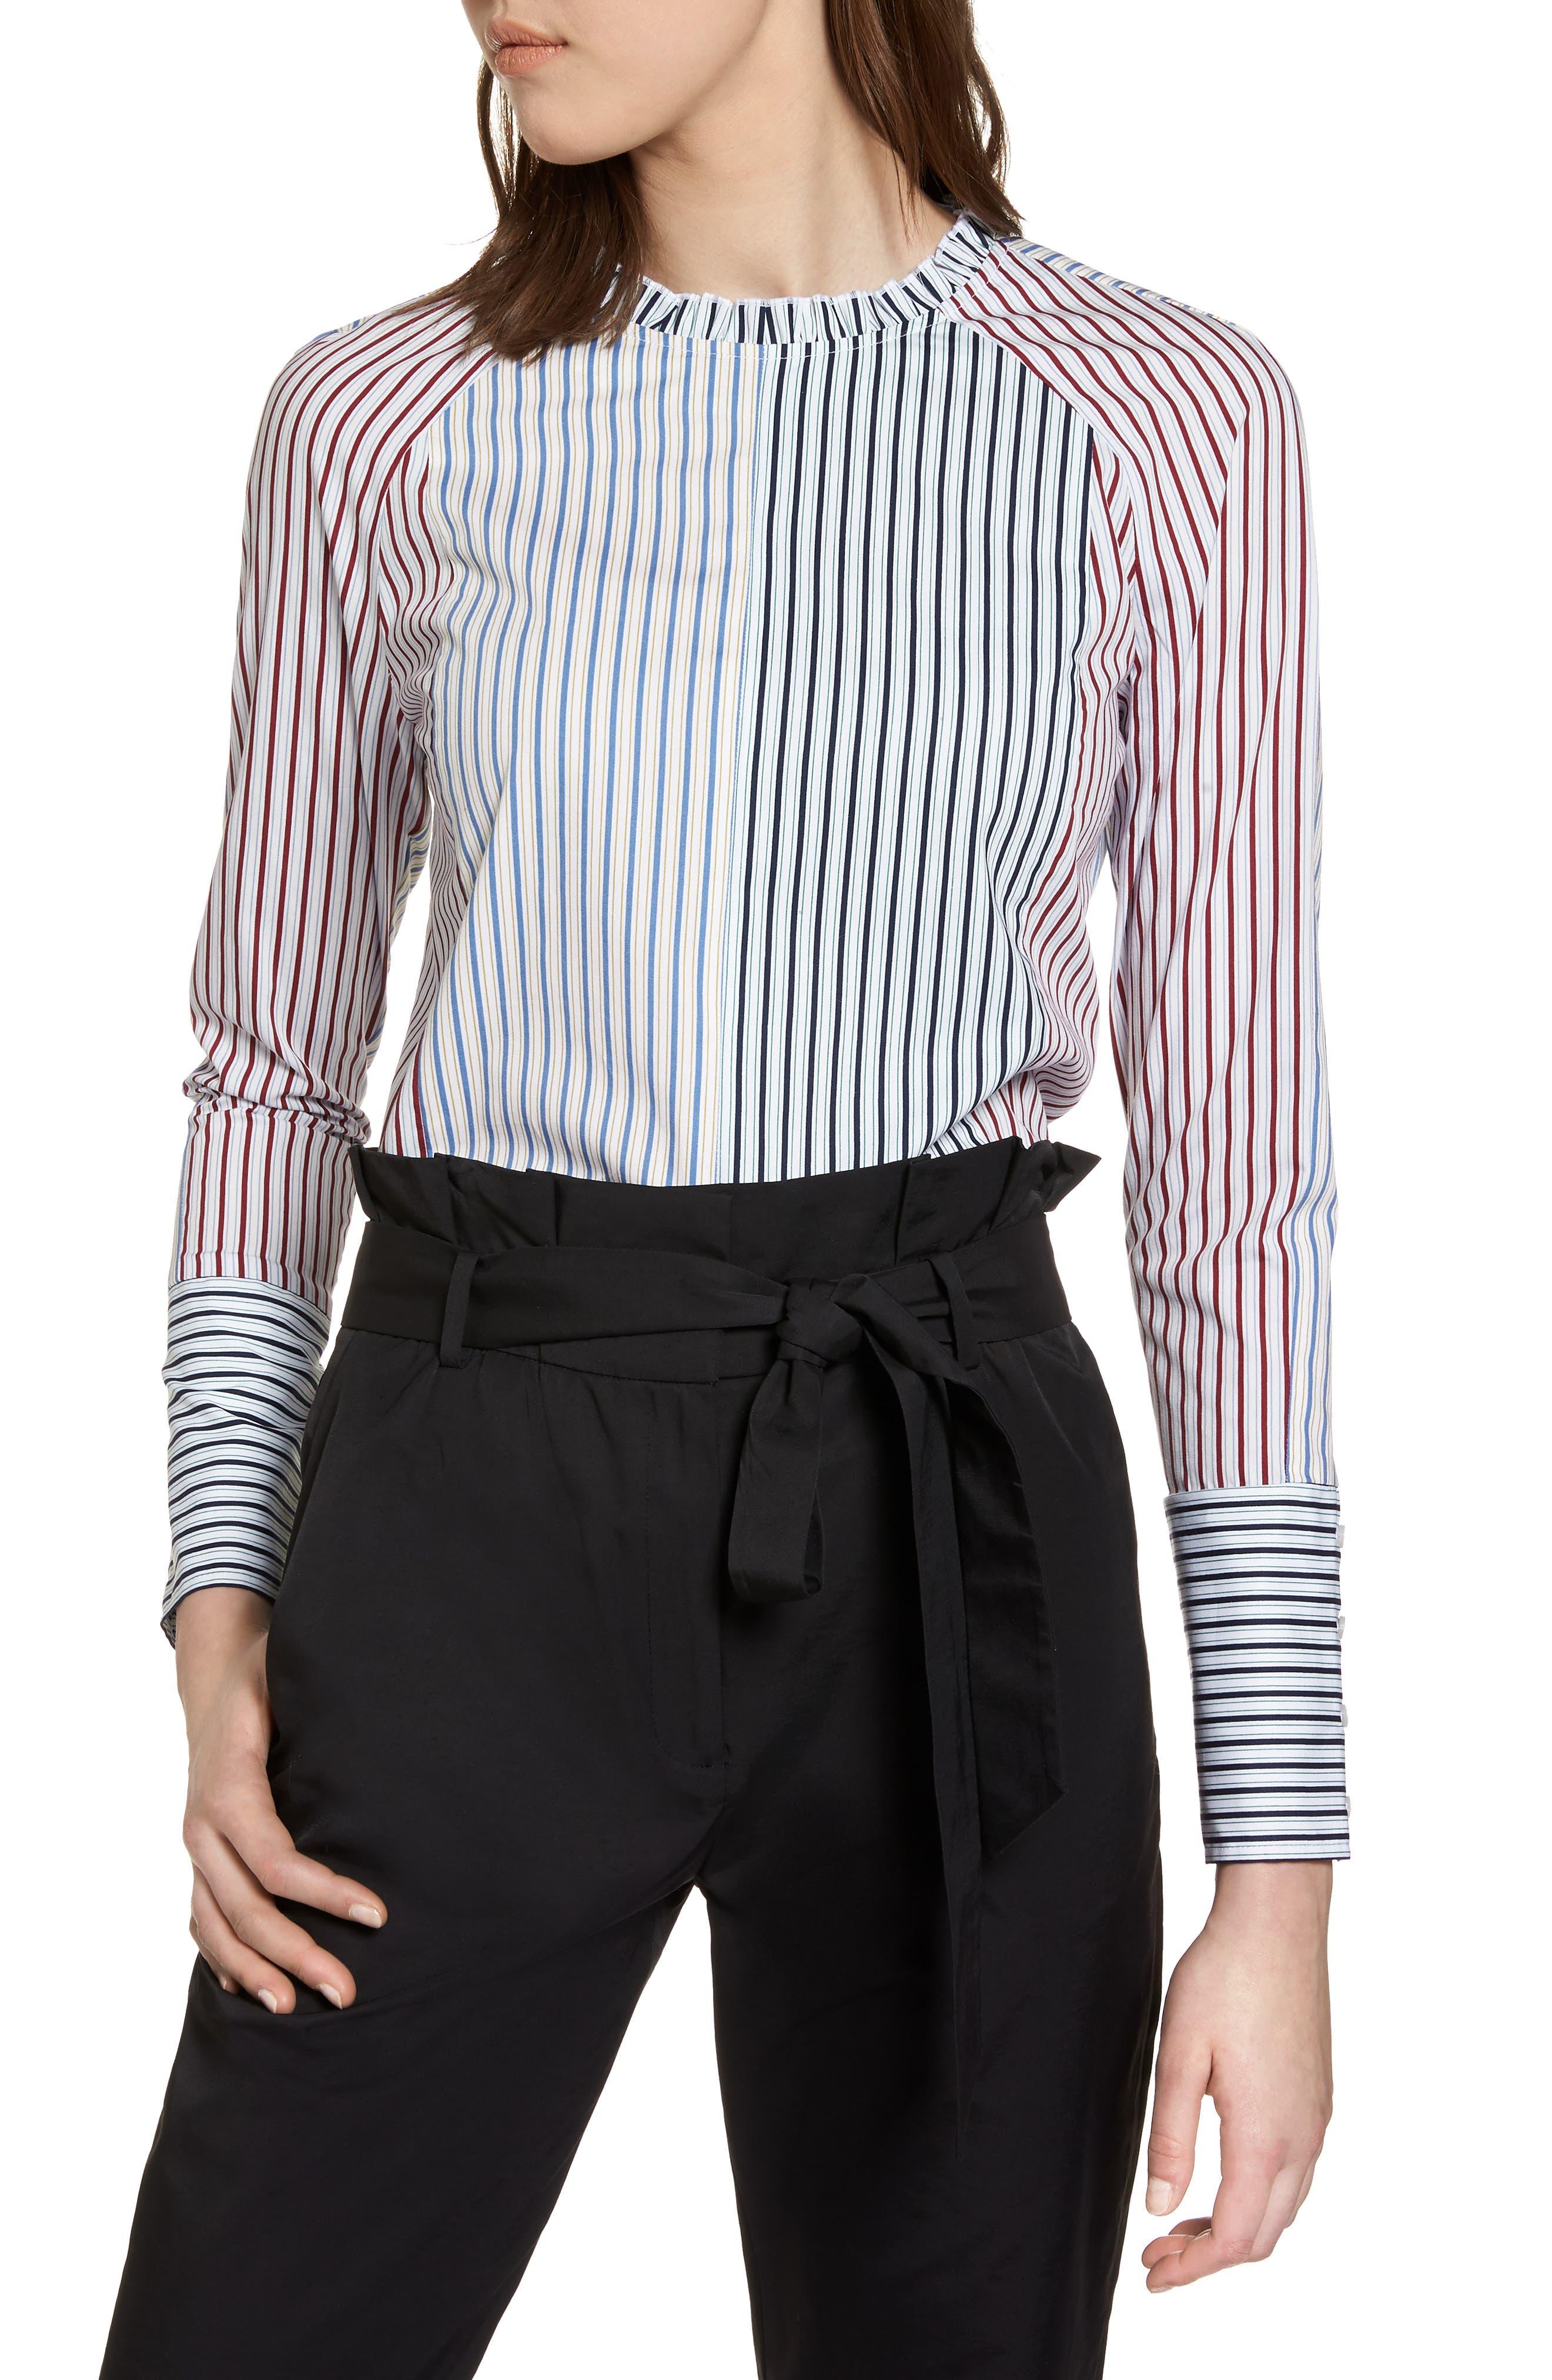 Mixed Stripe Cotton Shirt,                         Main,                         color, White Multi Mix Stripe